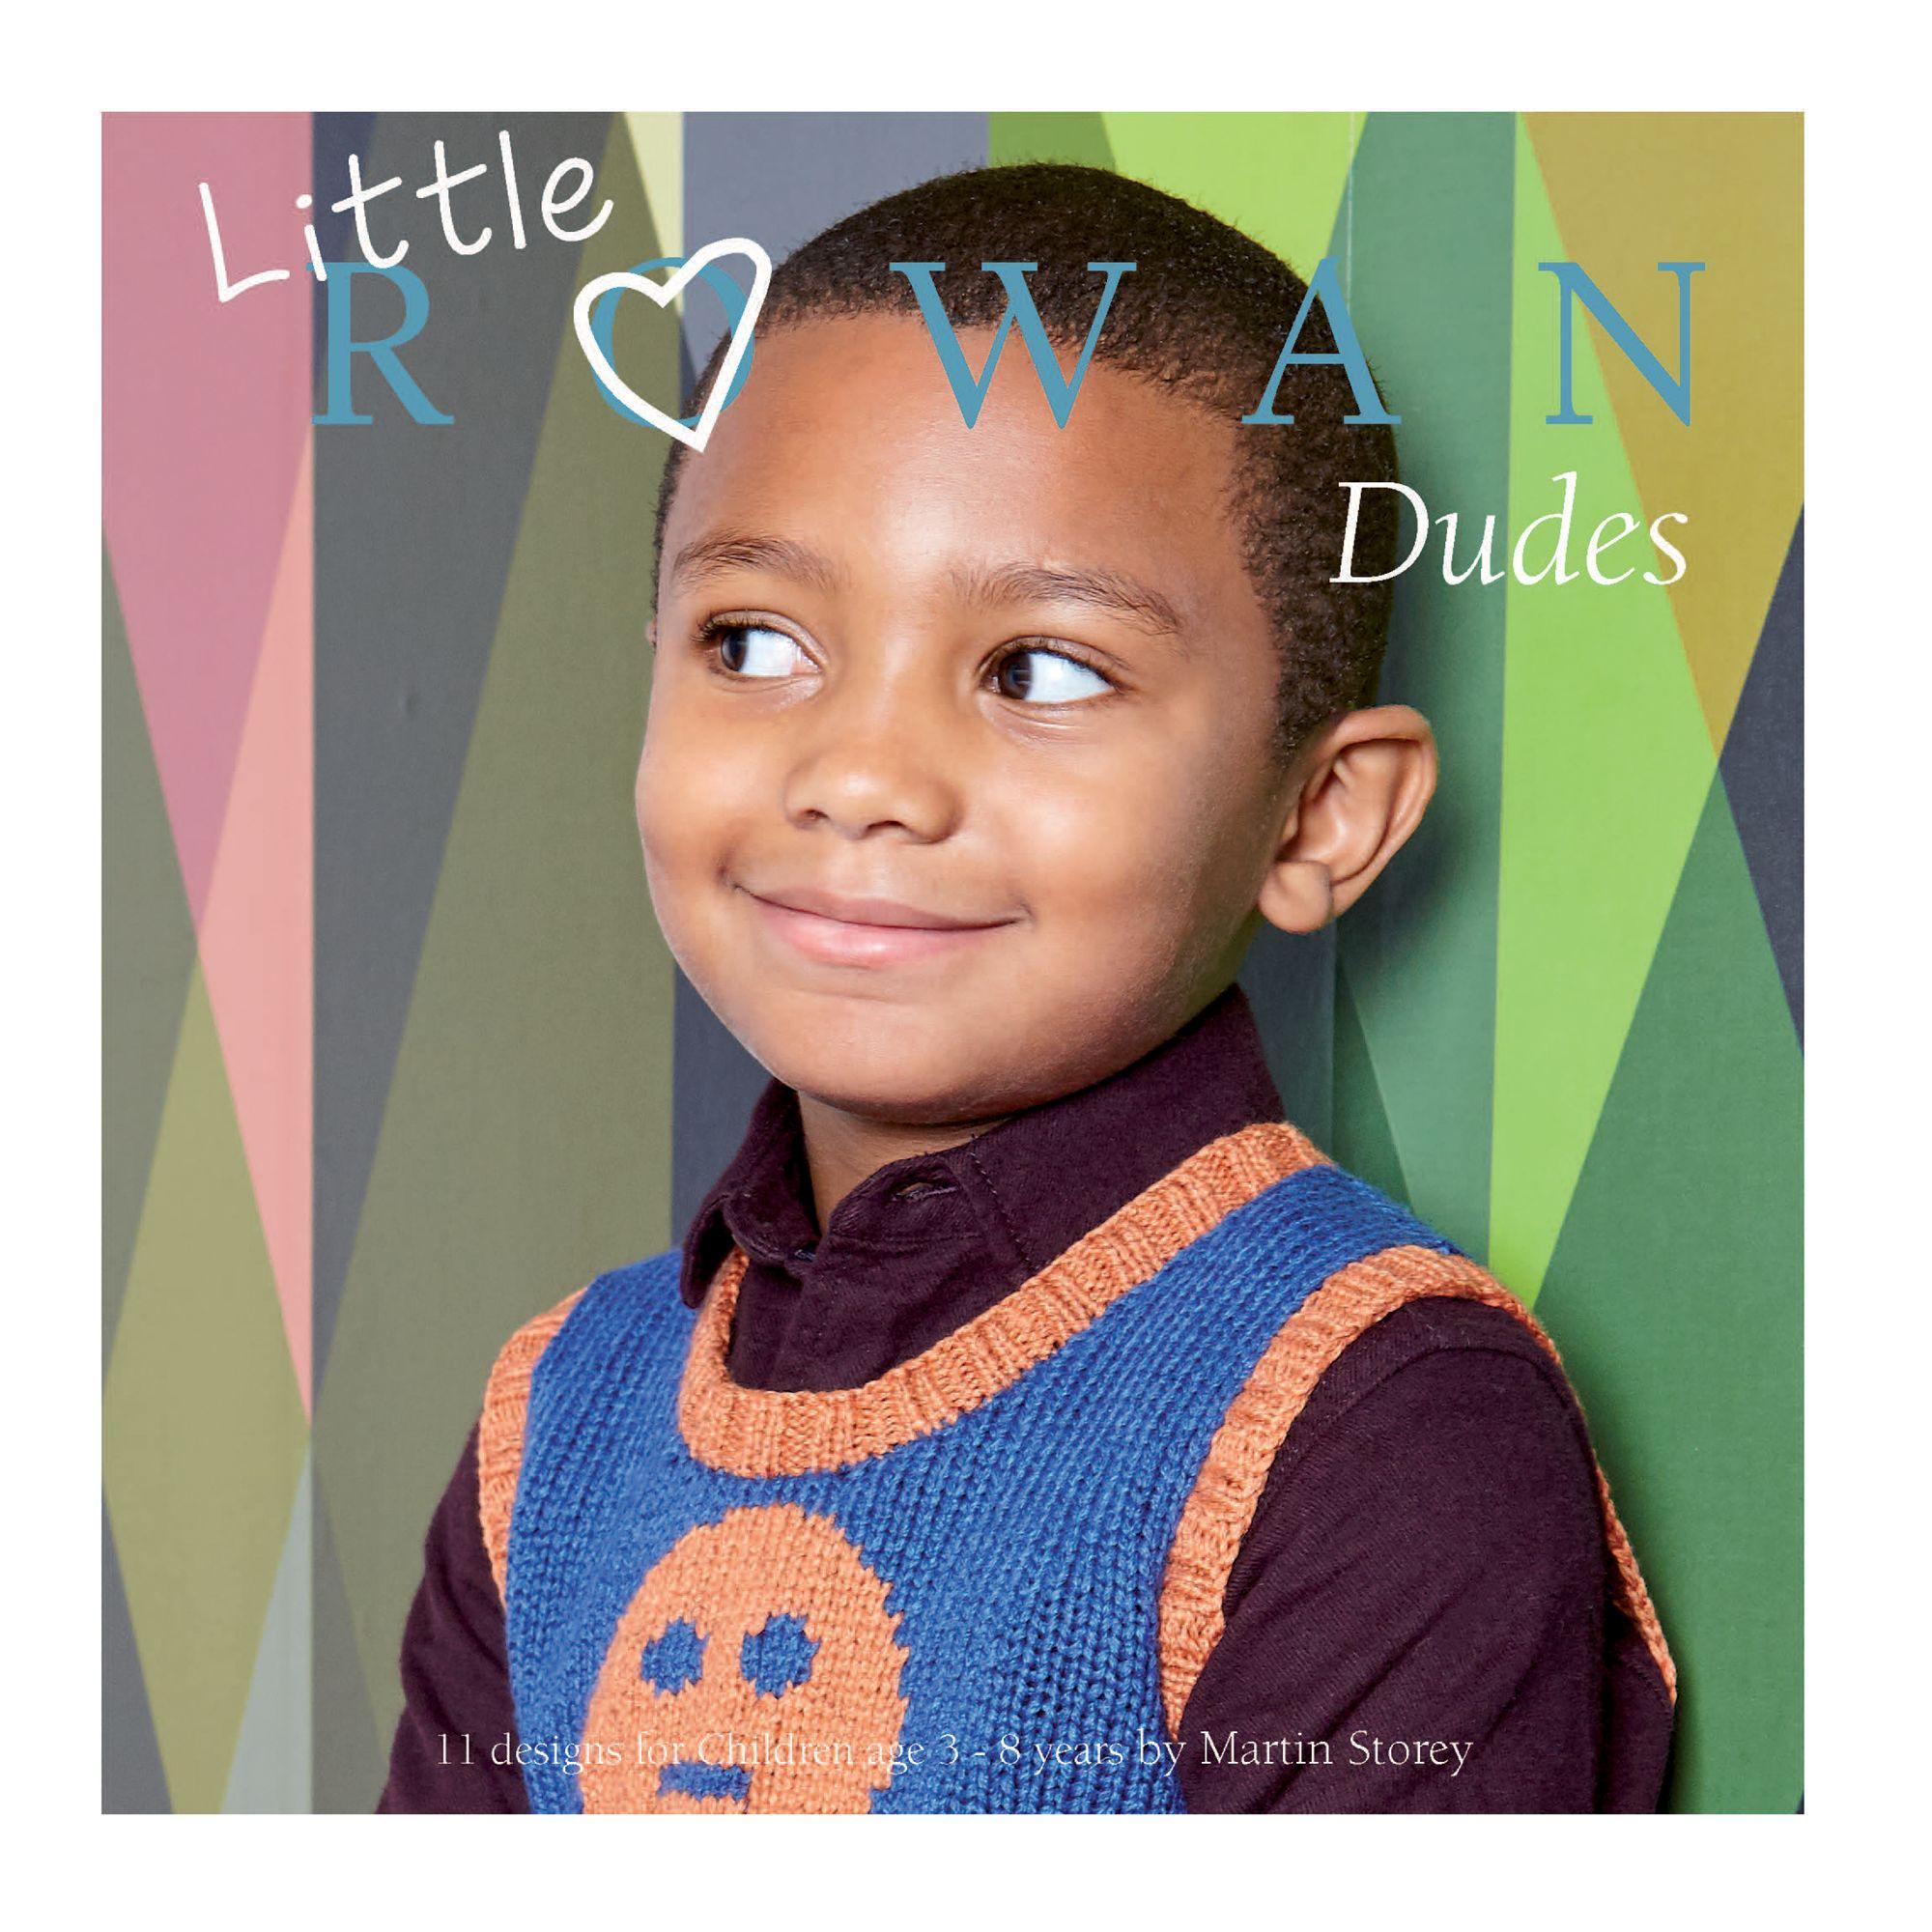 Rowan Little Dudes Collection Knitting Pattern Book by Martin Storey